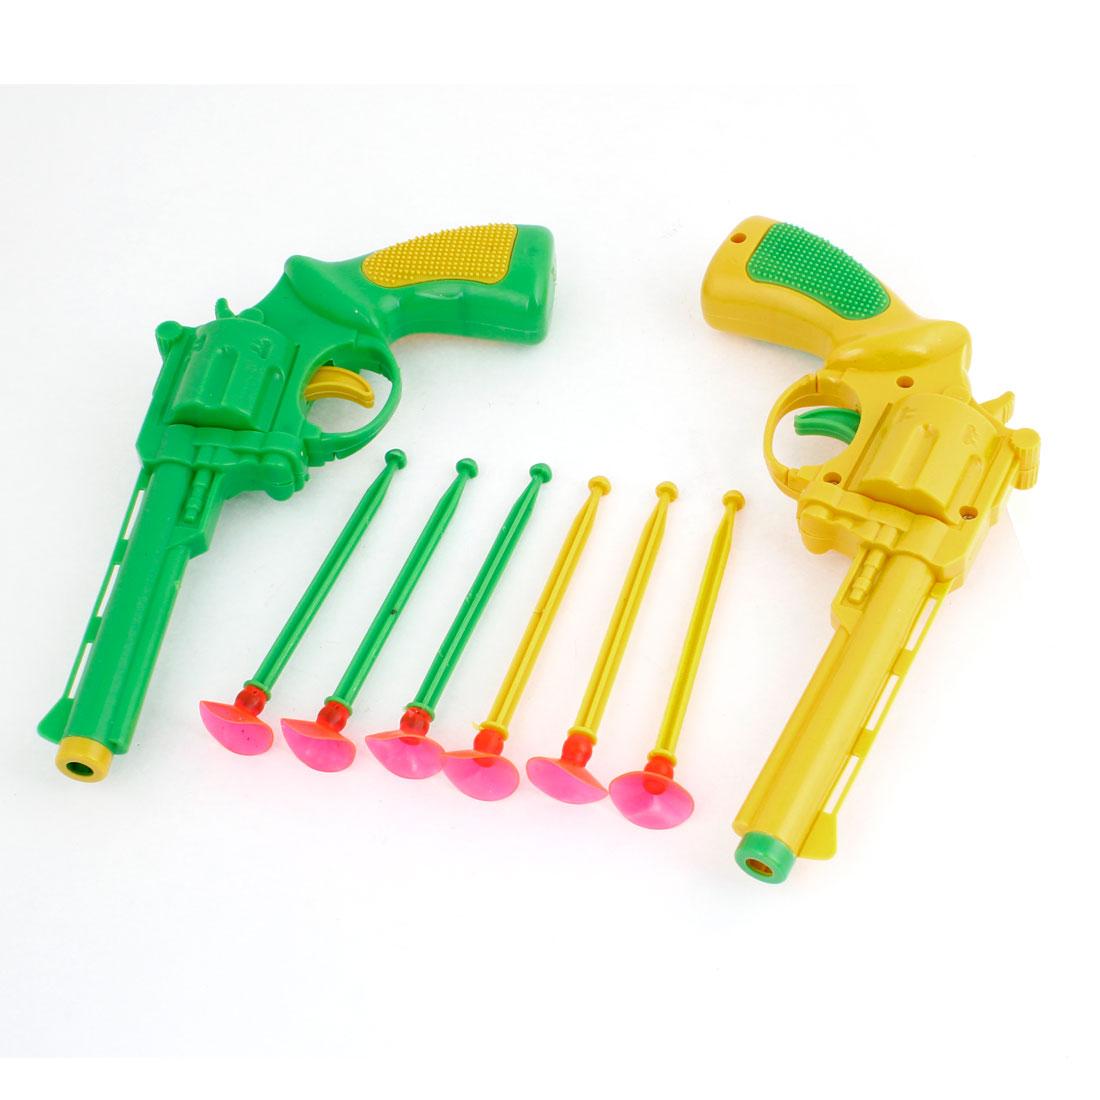 Child 2pcs Shooting Game Plastic Gun Toy w 6 Pcs Suction Cup Arrow